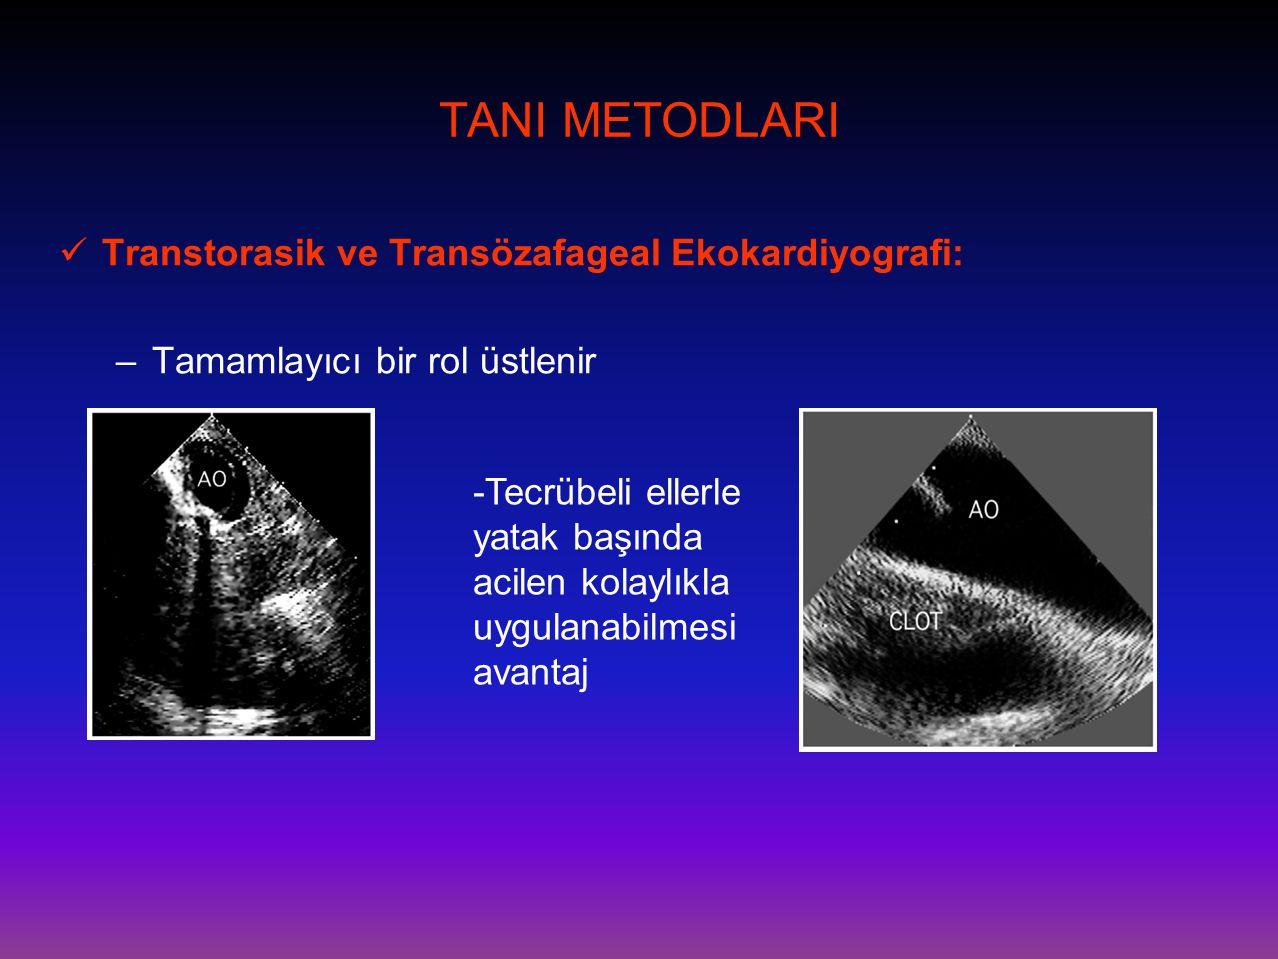 TANI METODLARI Transtorasik ve Transözafageal Ekokardiyografi: